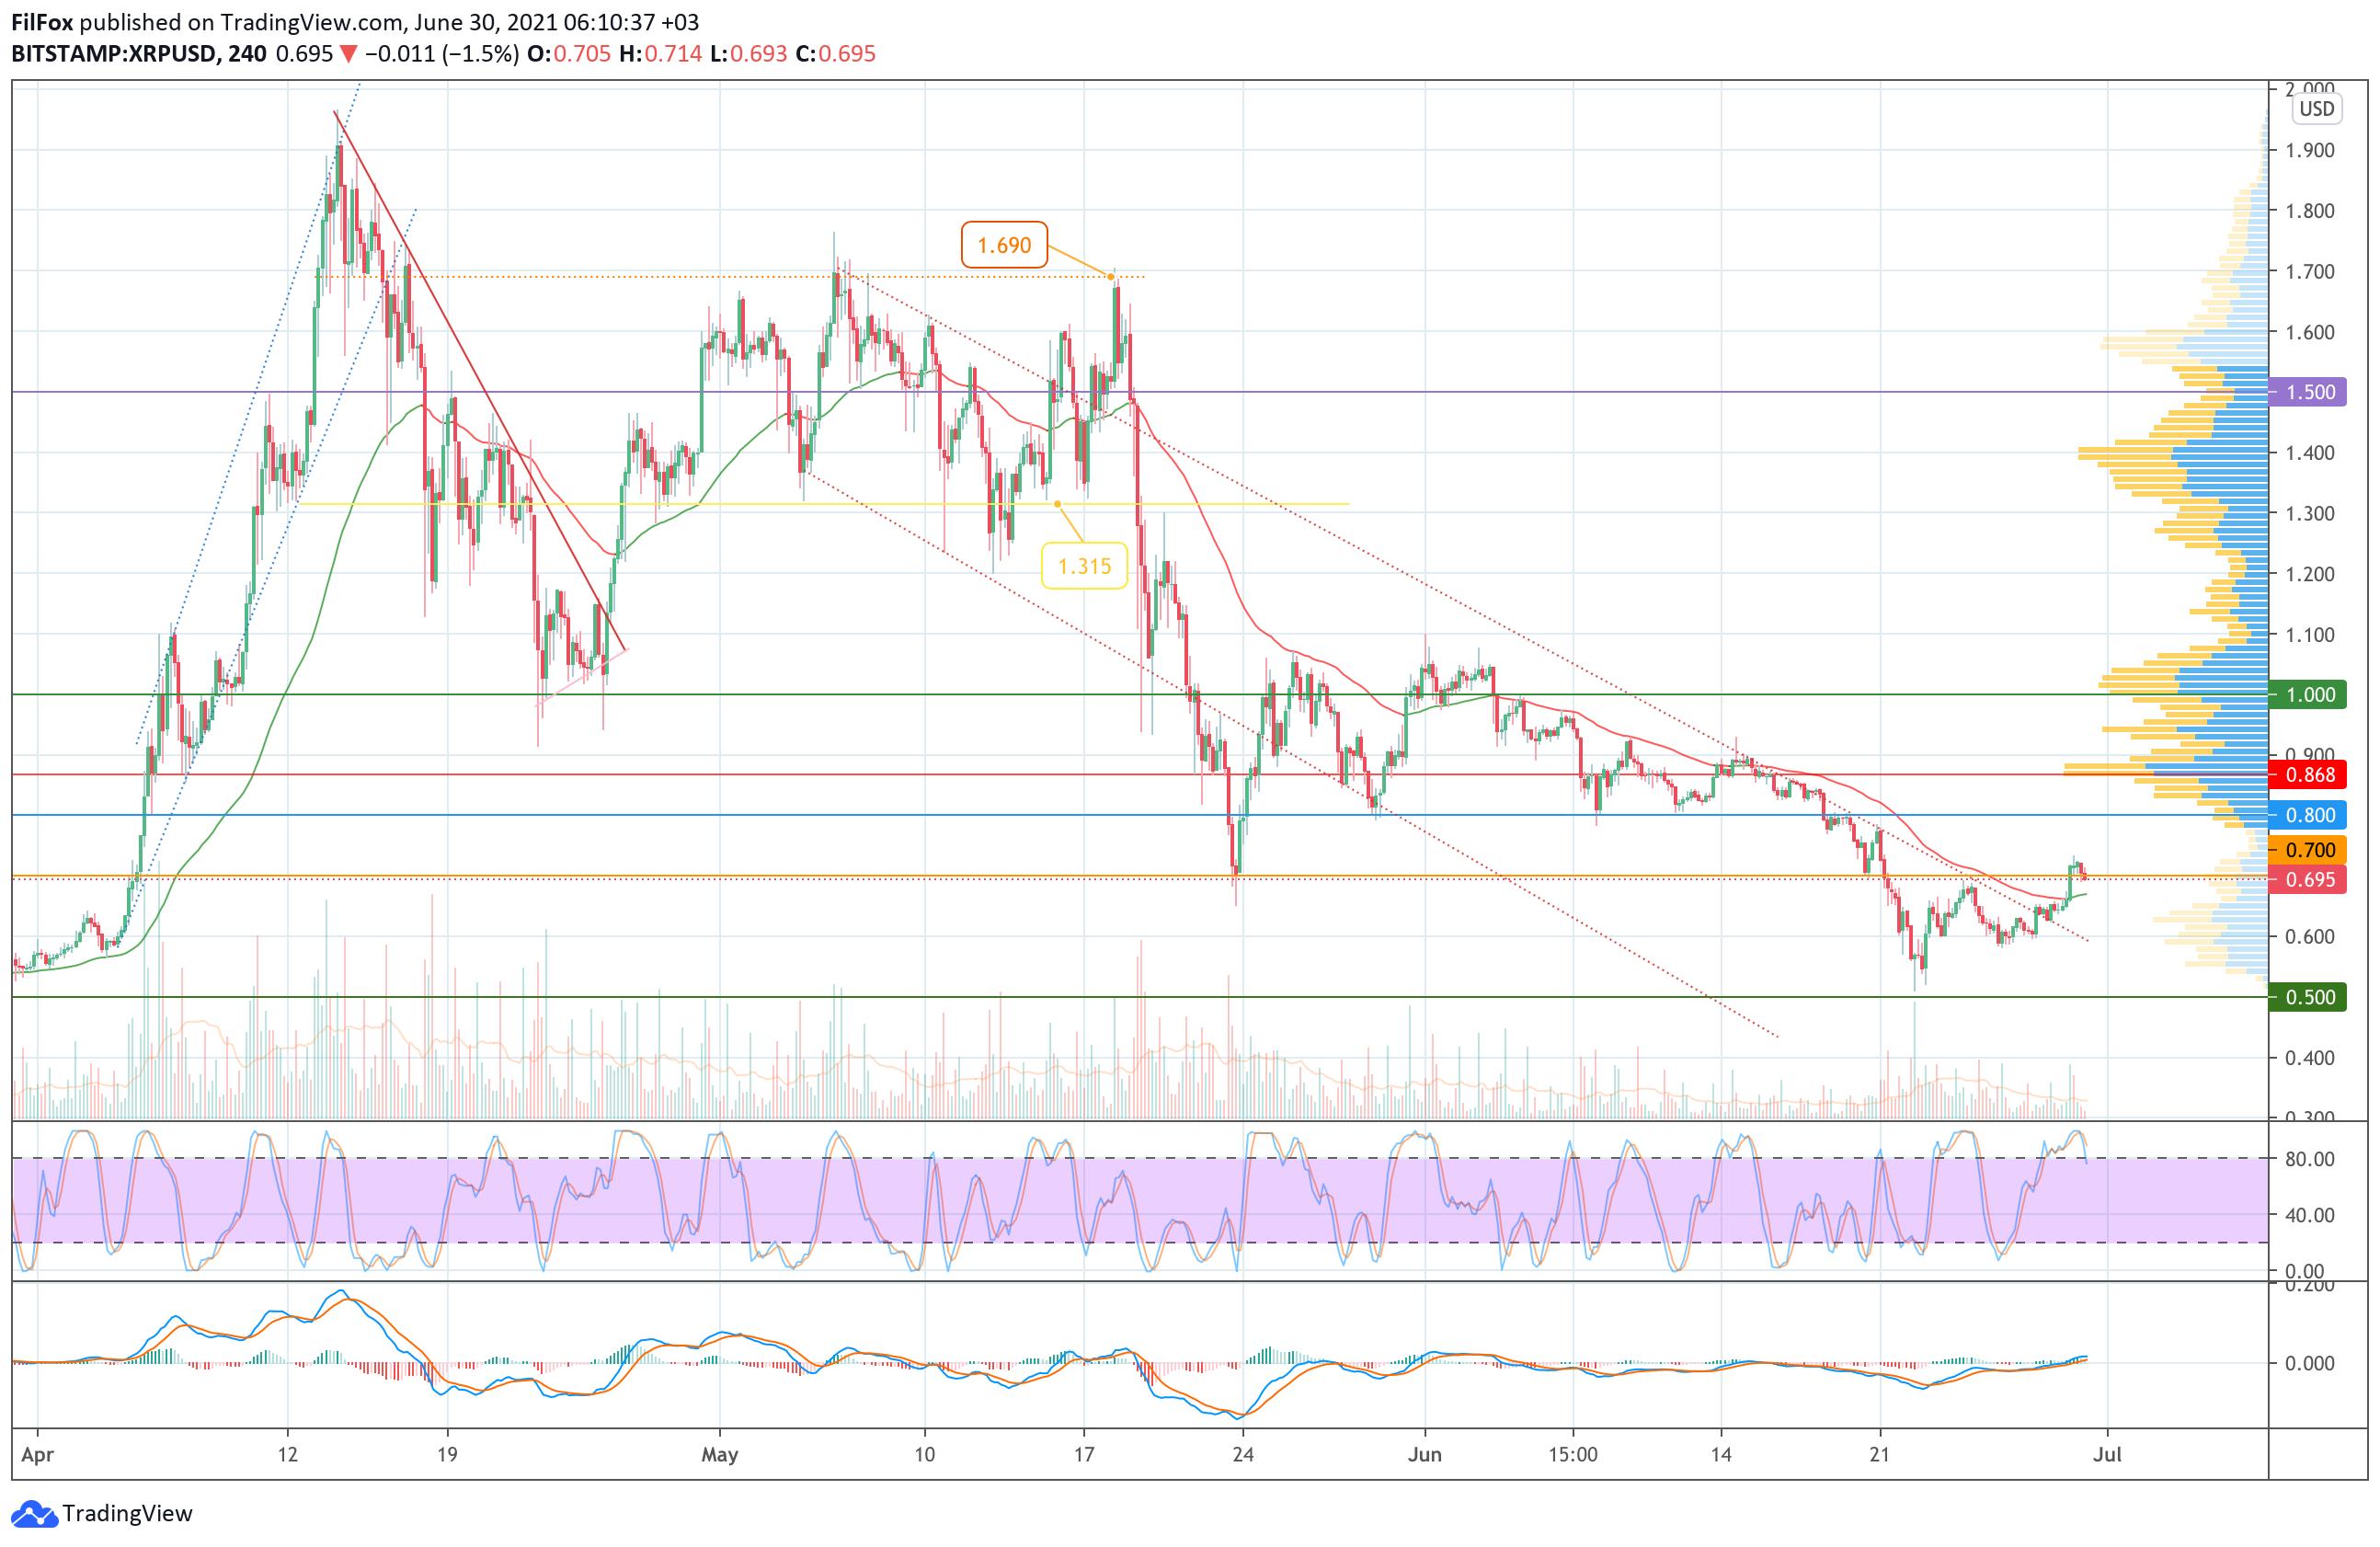 Анализ цен Bitcoin, Ethereum, XRP на 30.06.2021